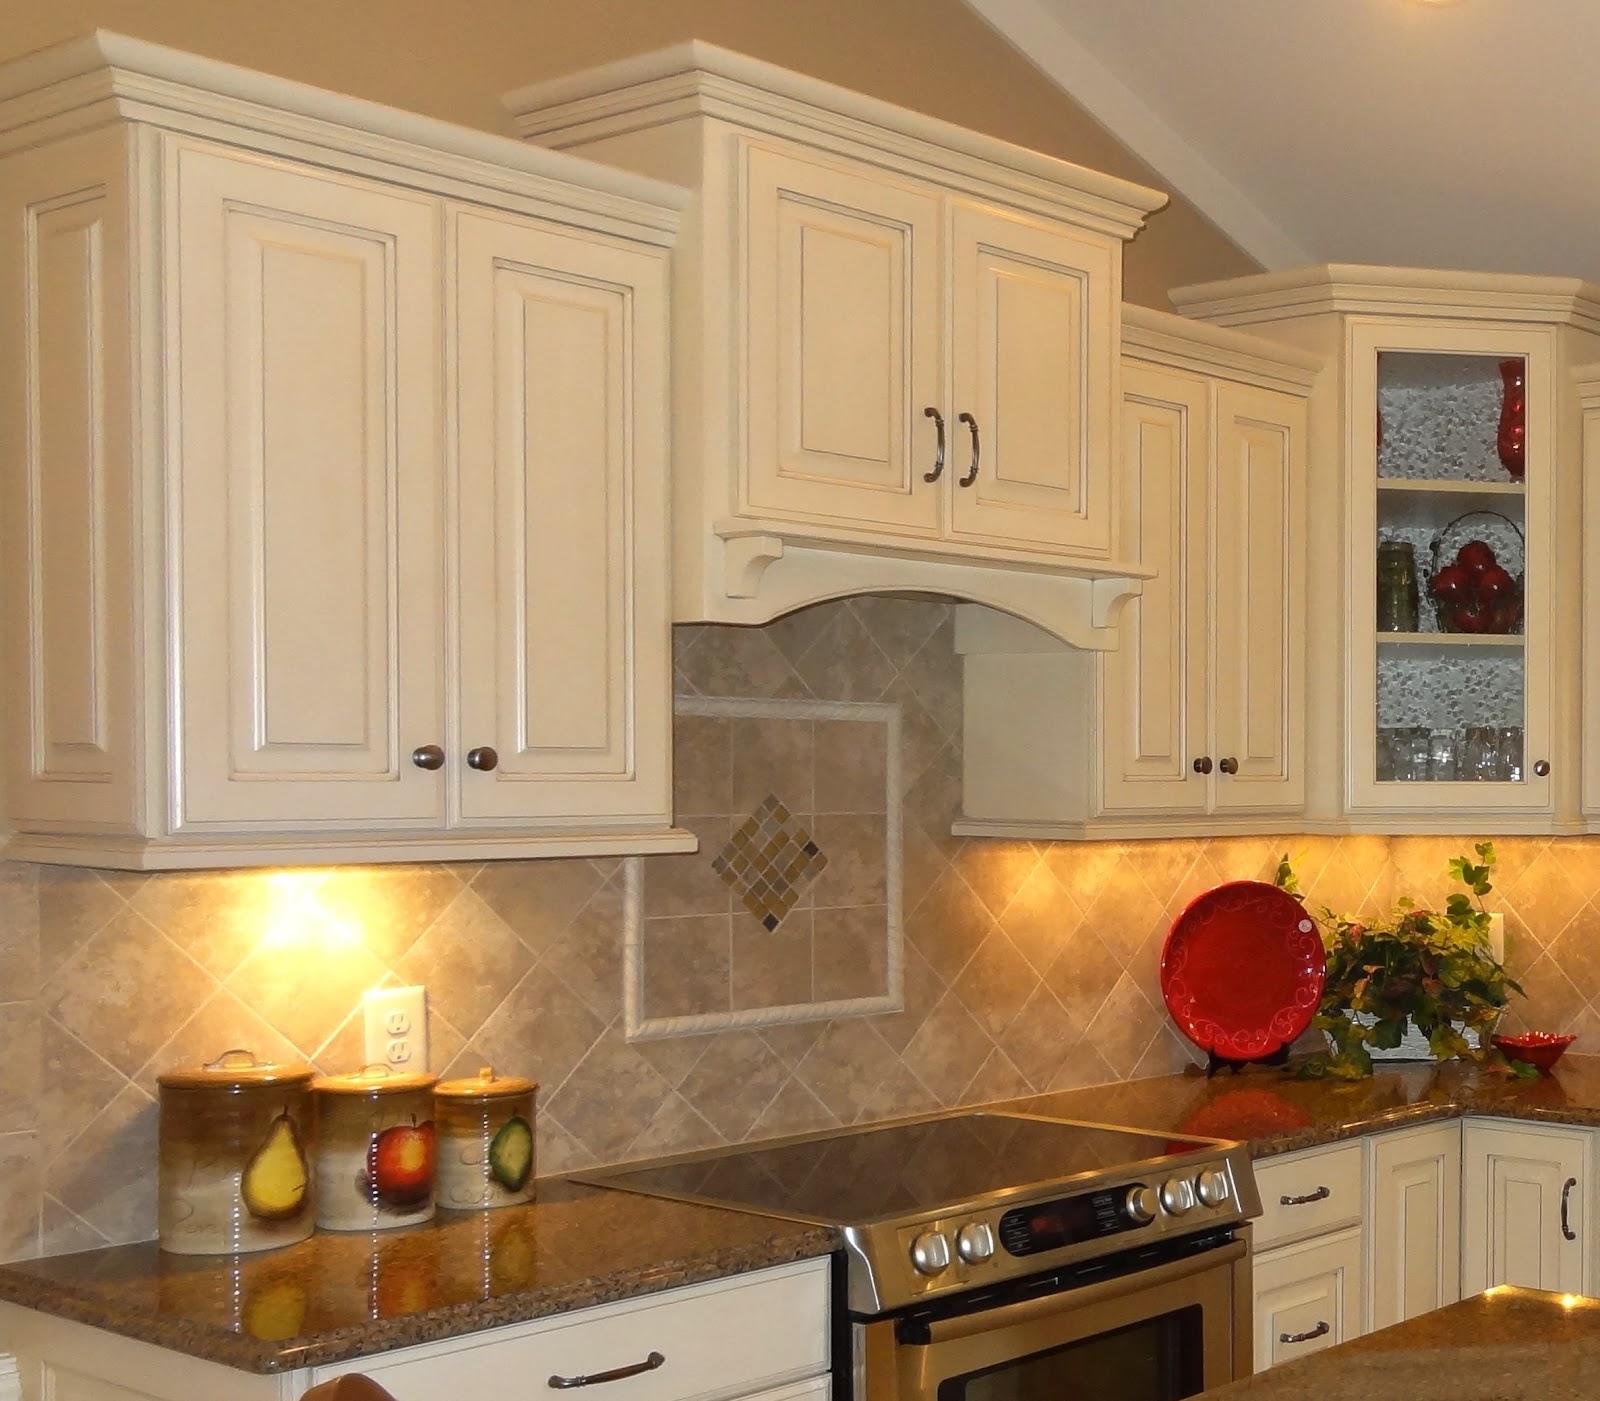 Amazing How To Put Up Tile Backsplash In Kitchen #2: Kitchen+Phipps+hardware.jpg